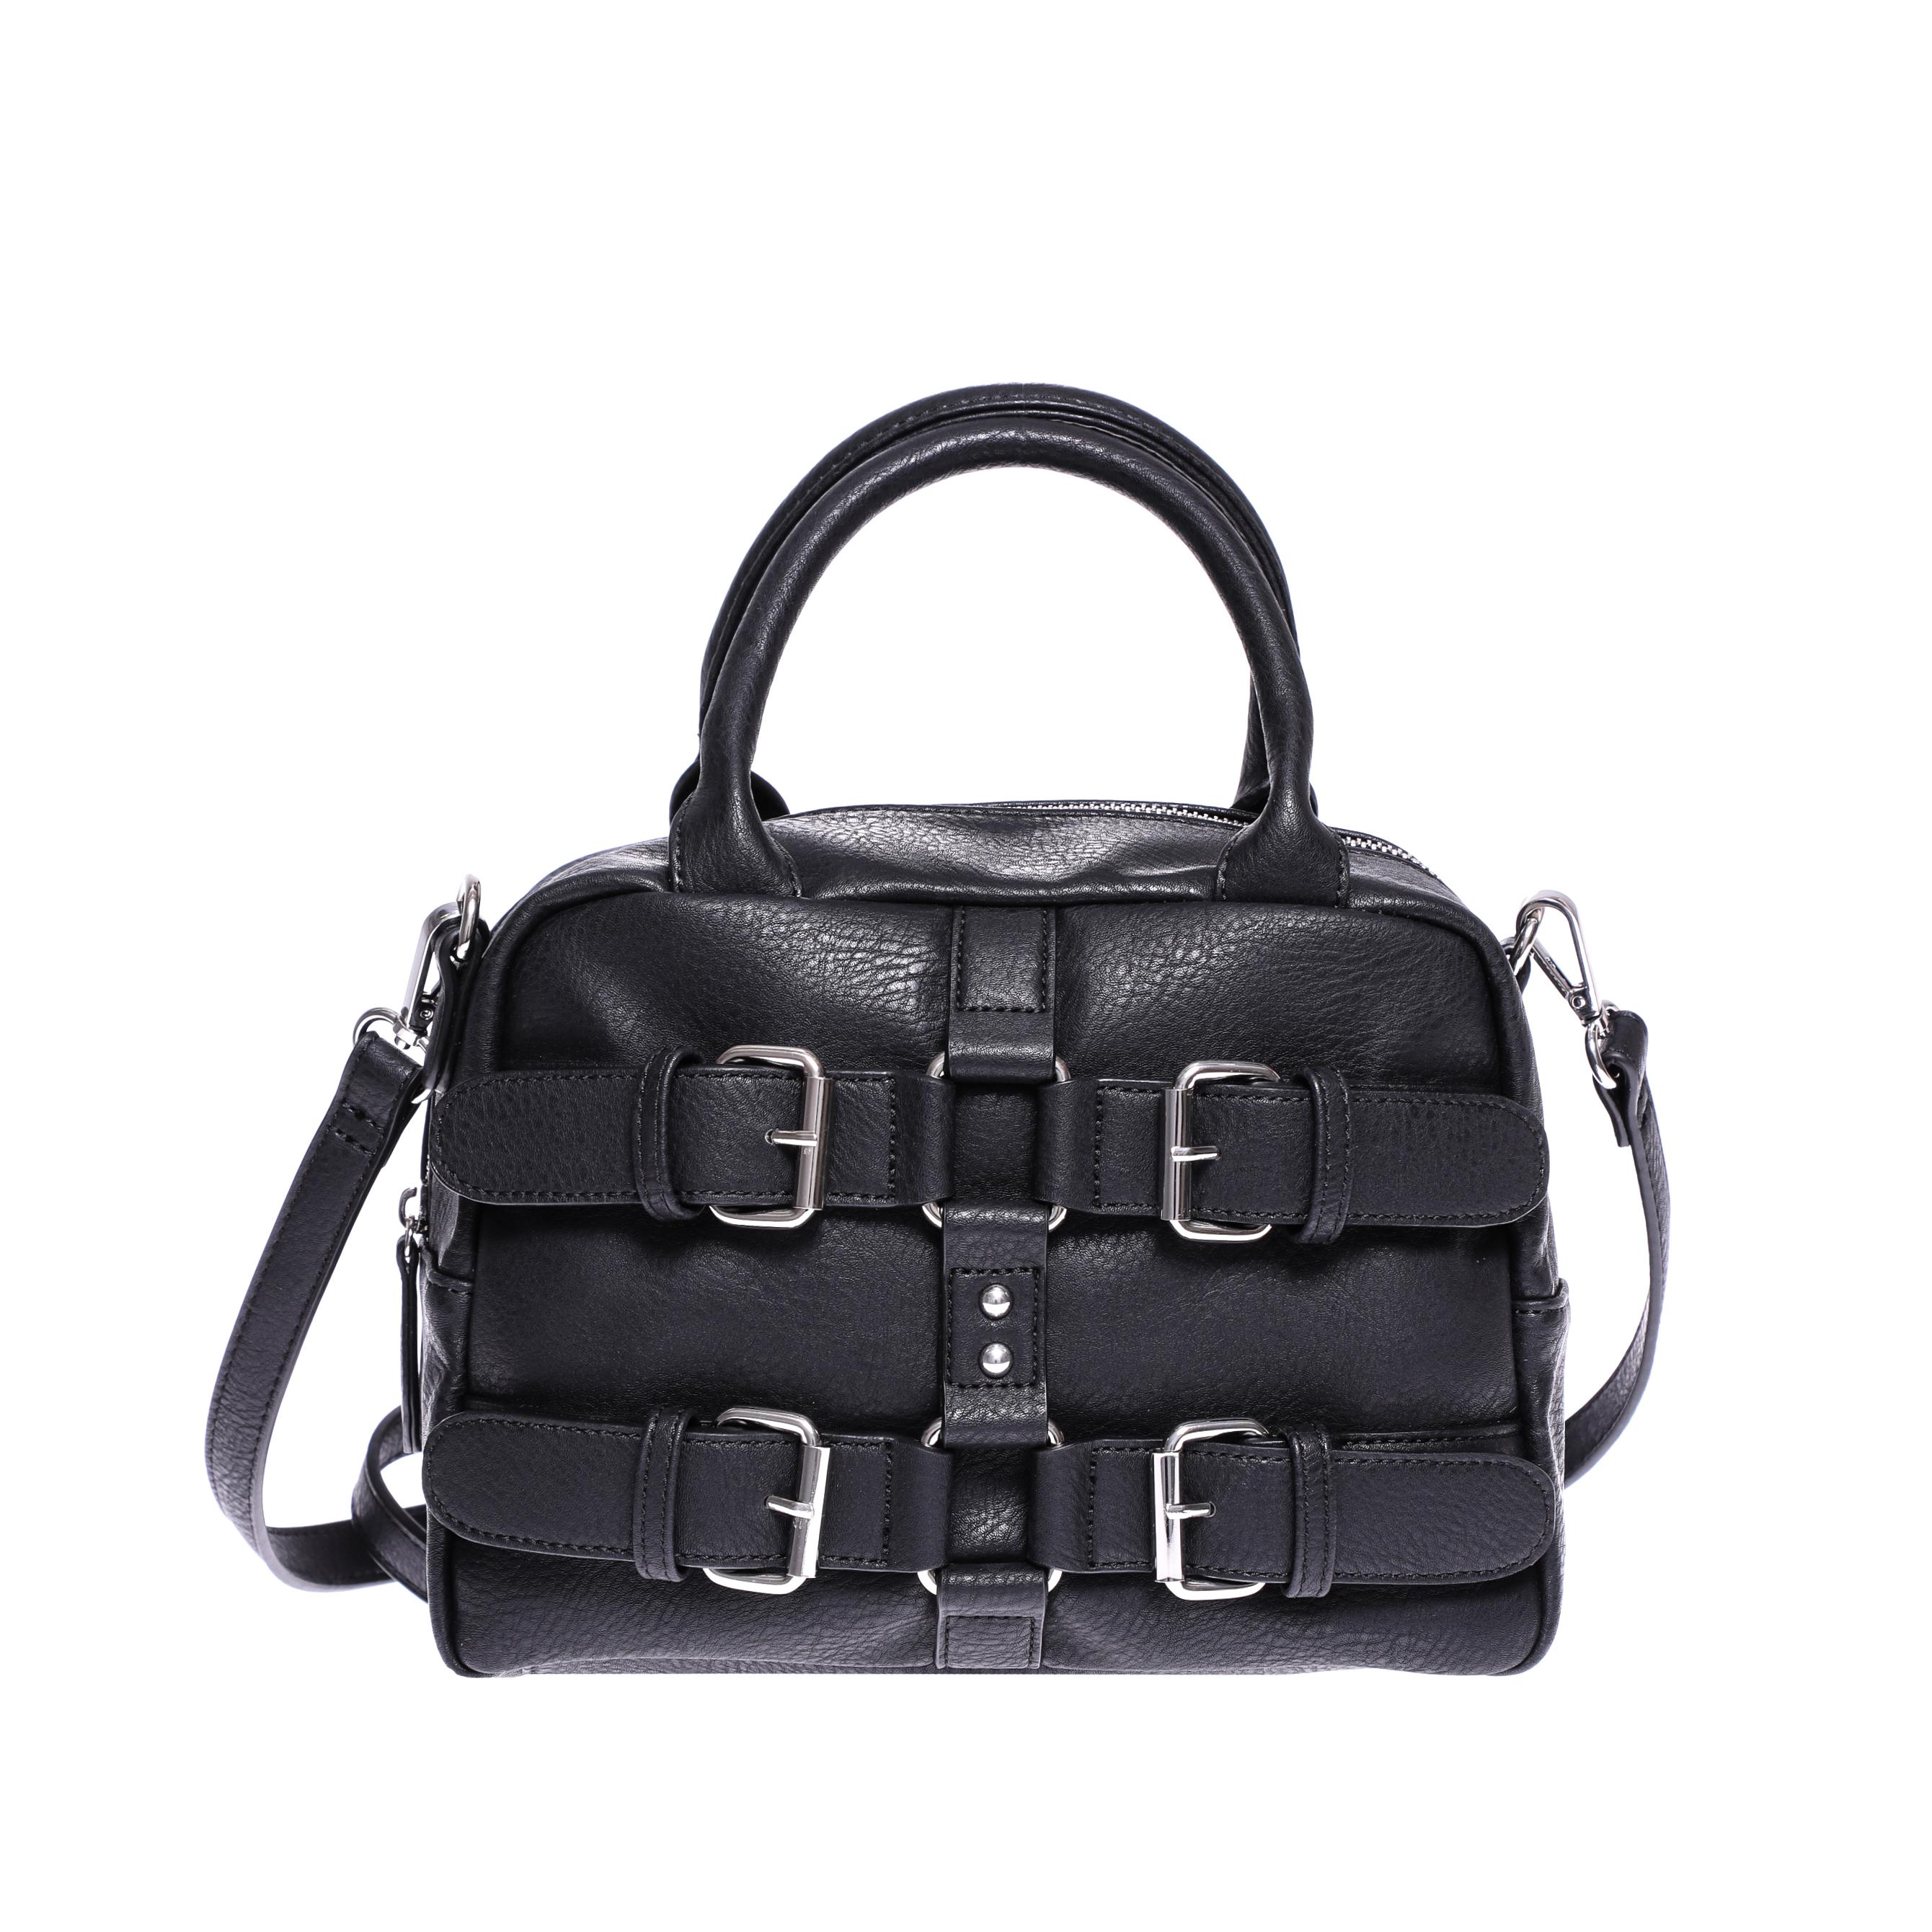 DENNY ROSE - Γυναικεία τσάντα Denny Rose μαύρη γυναικεία αξεσουάρ τσάντες σακίδια χειρός